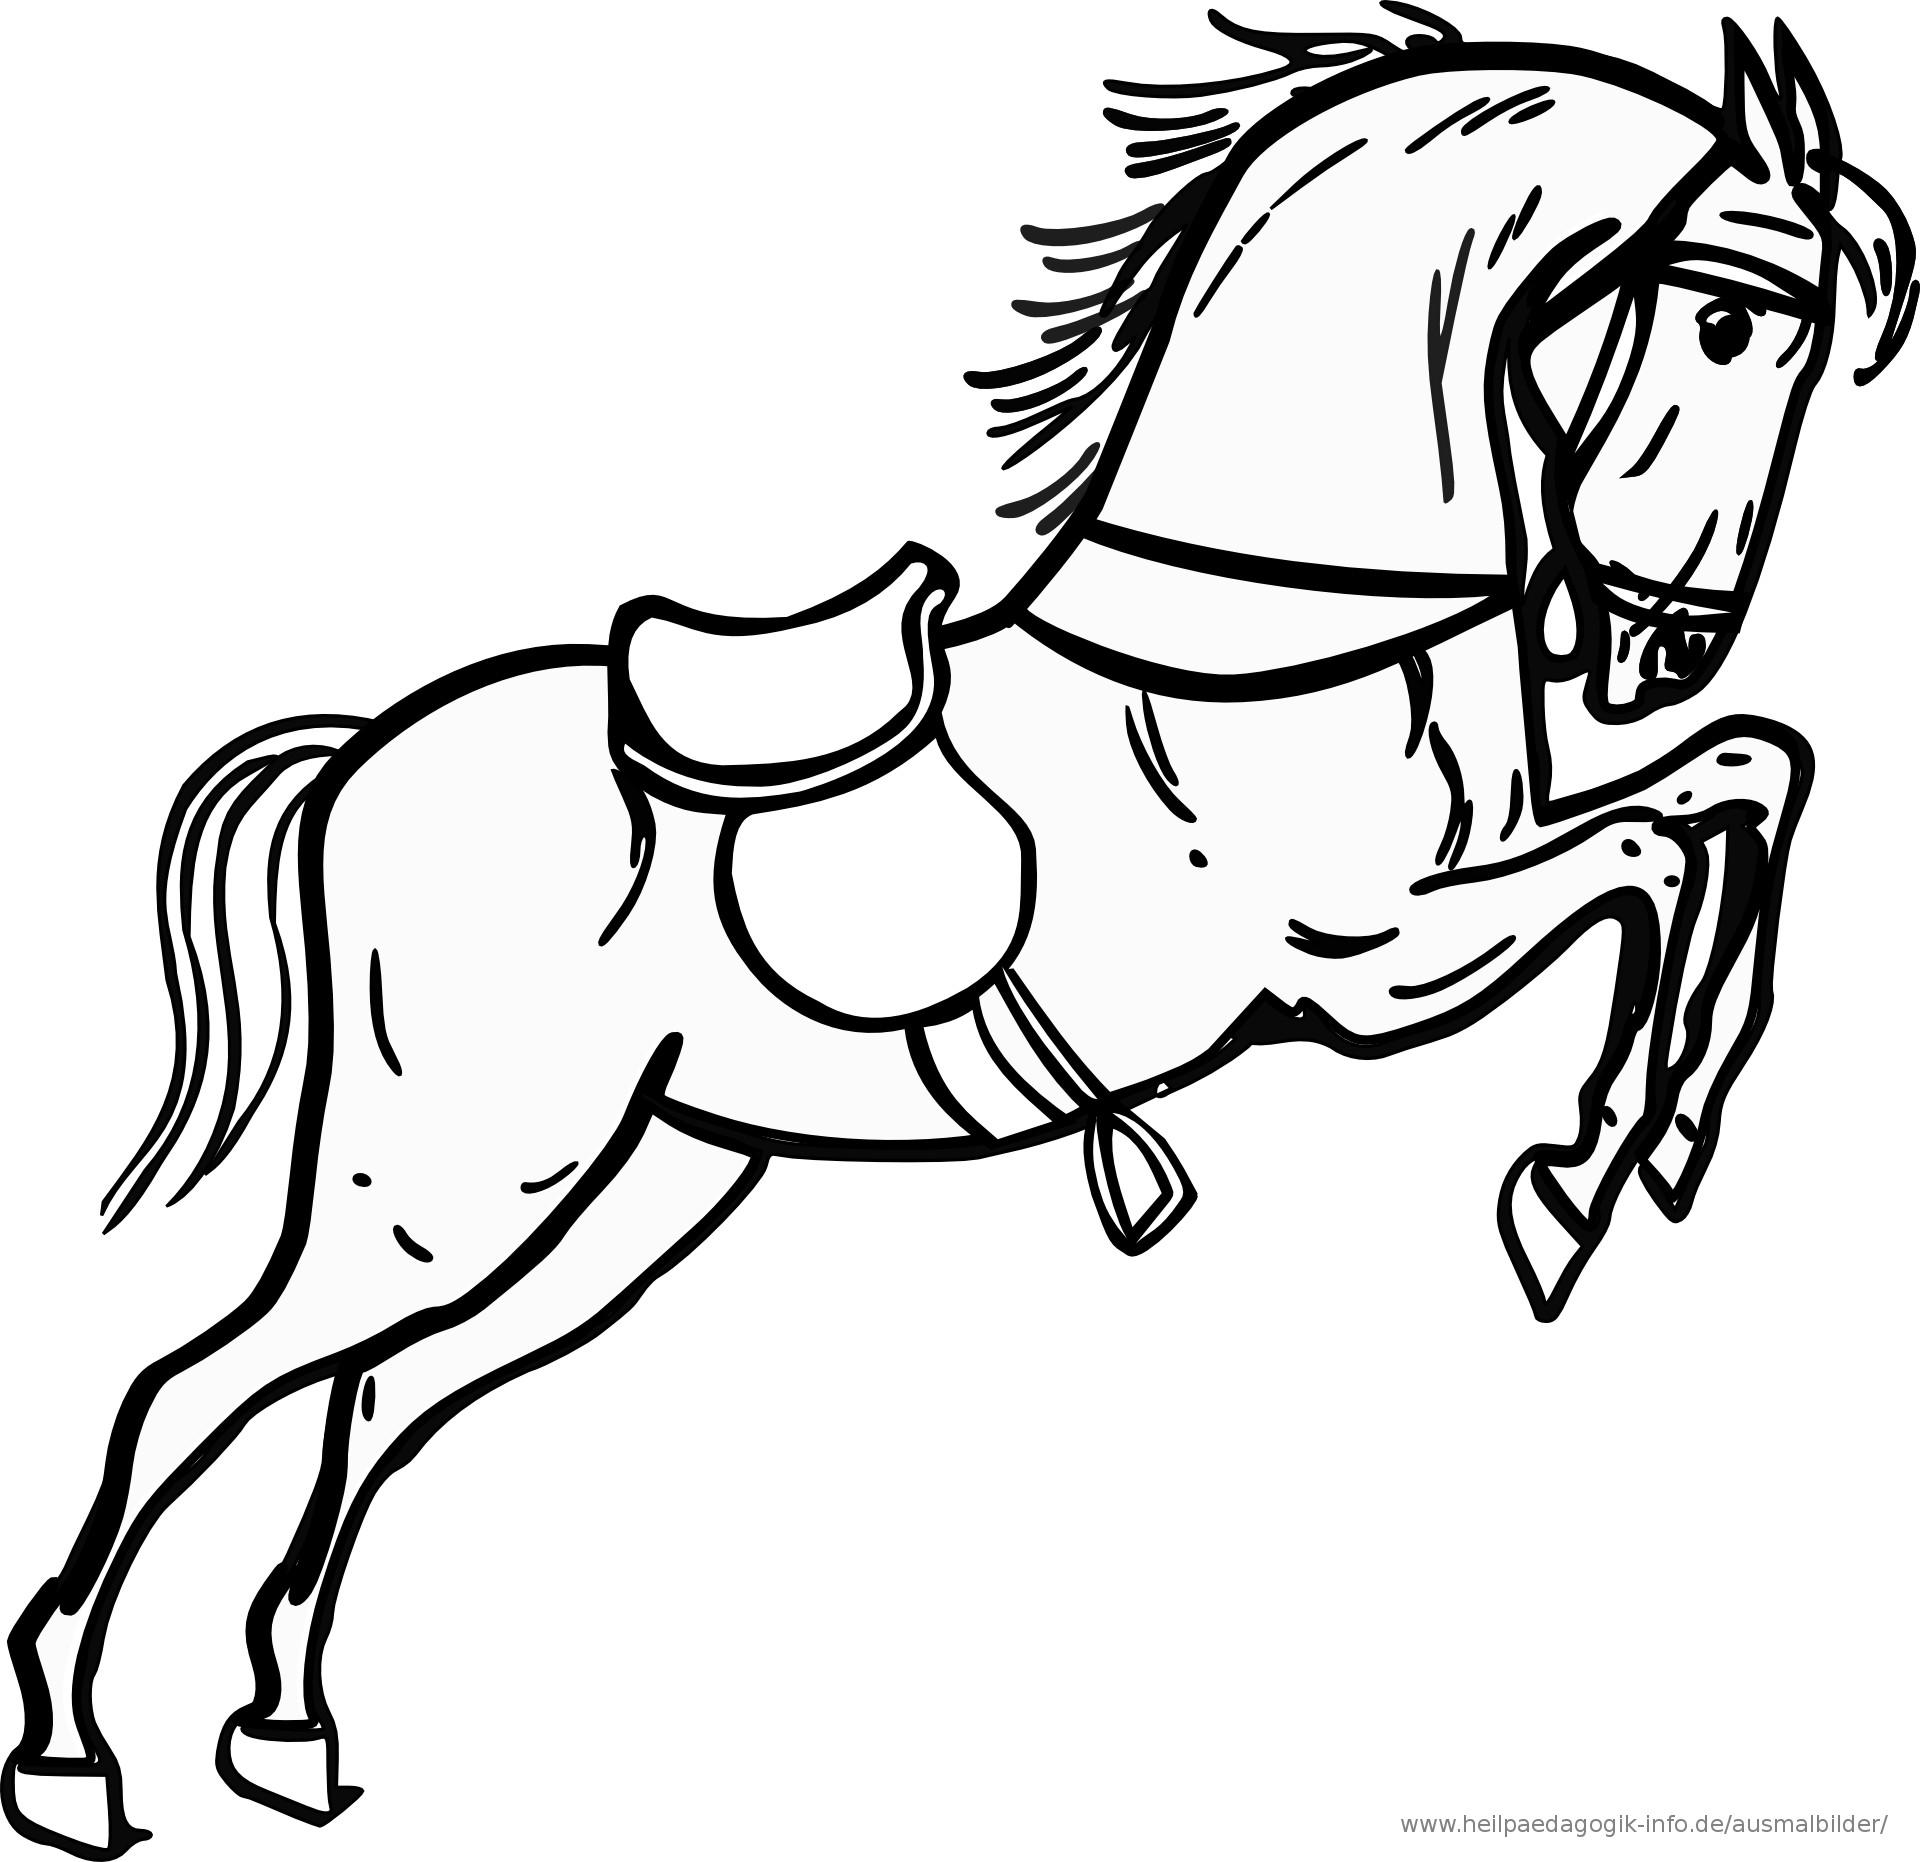 Ausmalbilder Pferd  AUSMALBILDER PFERDE 02 Pferde